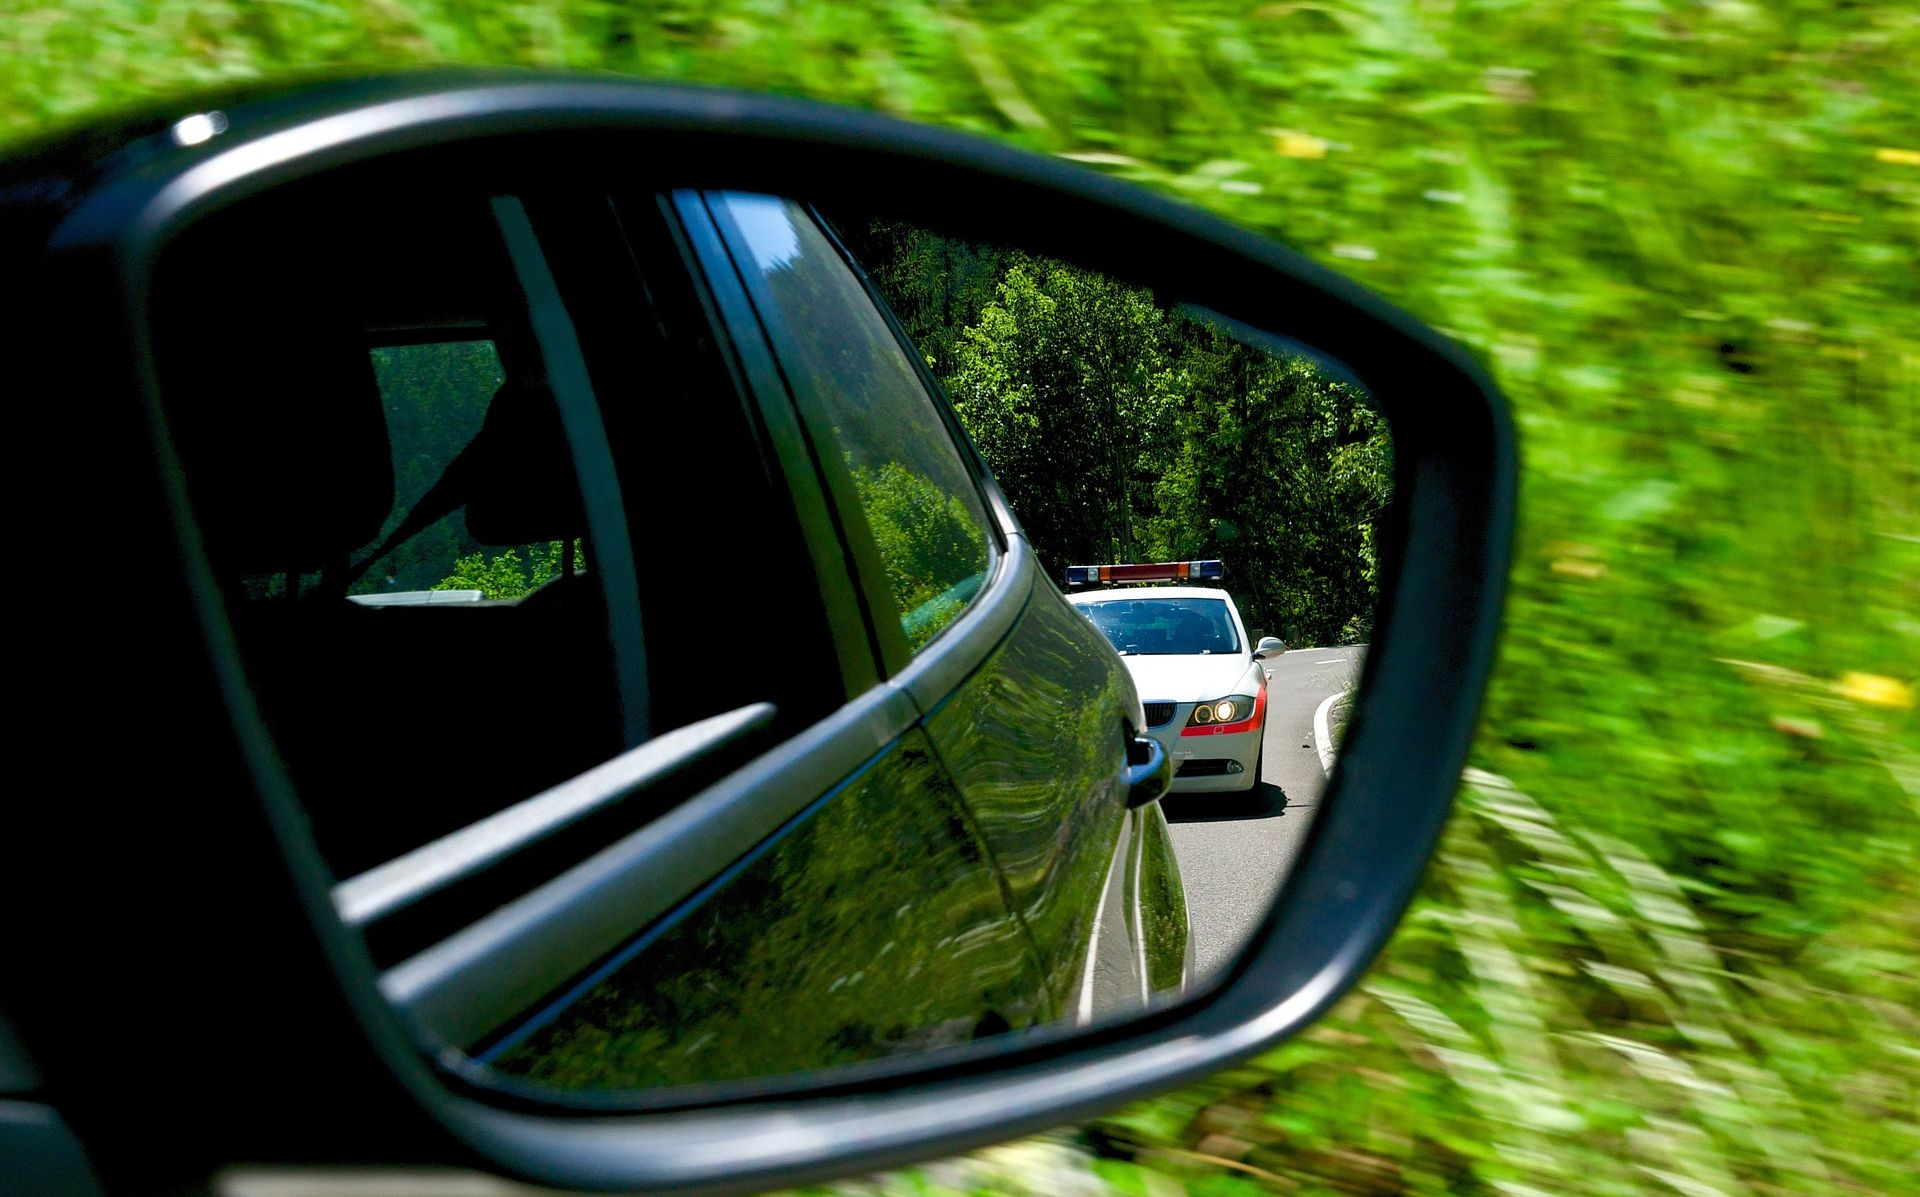 PROŠLI BEZ KAZNE Policija zaustavila Googleov samovozeći automobil zbog prespore vožnje